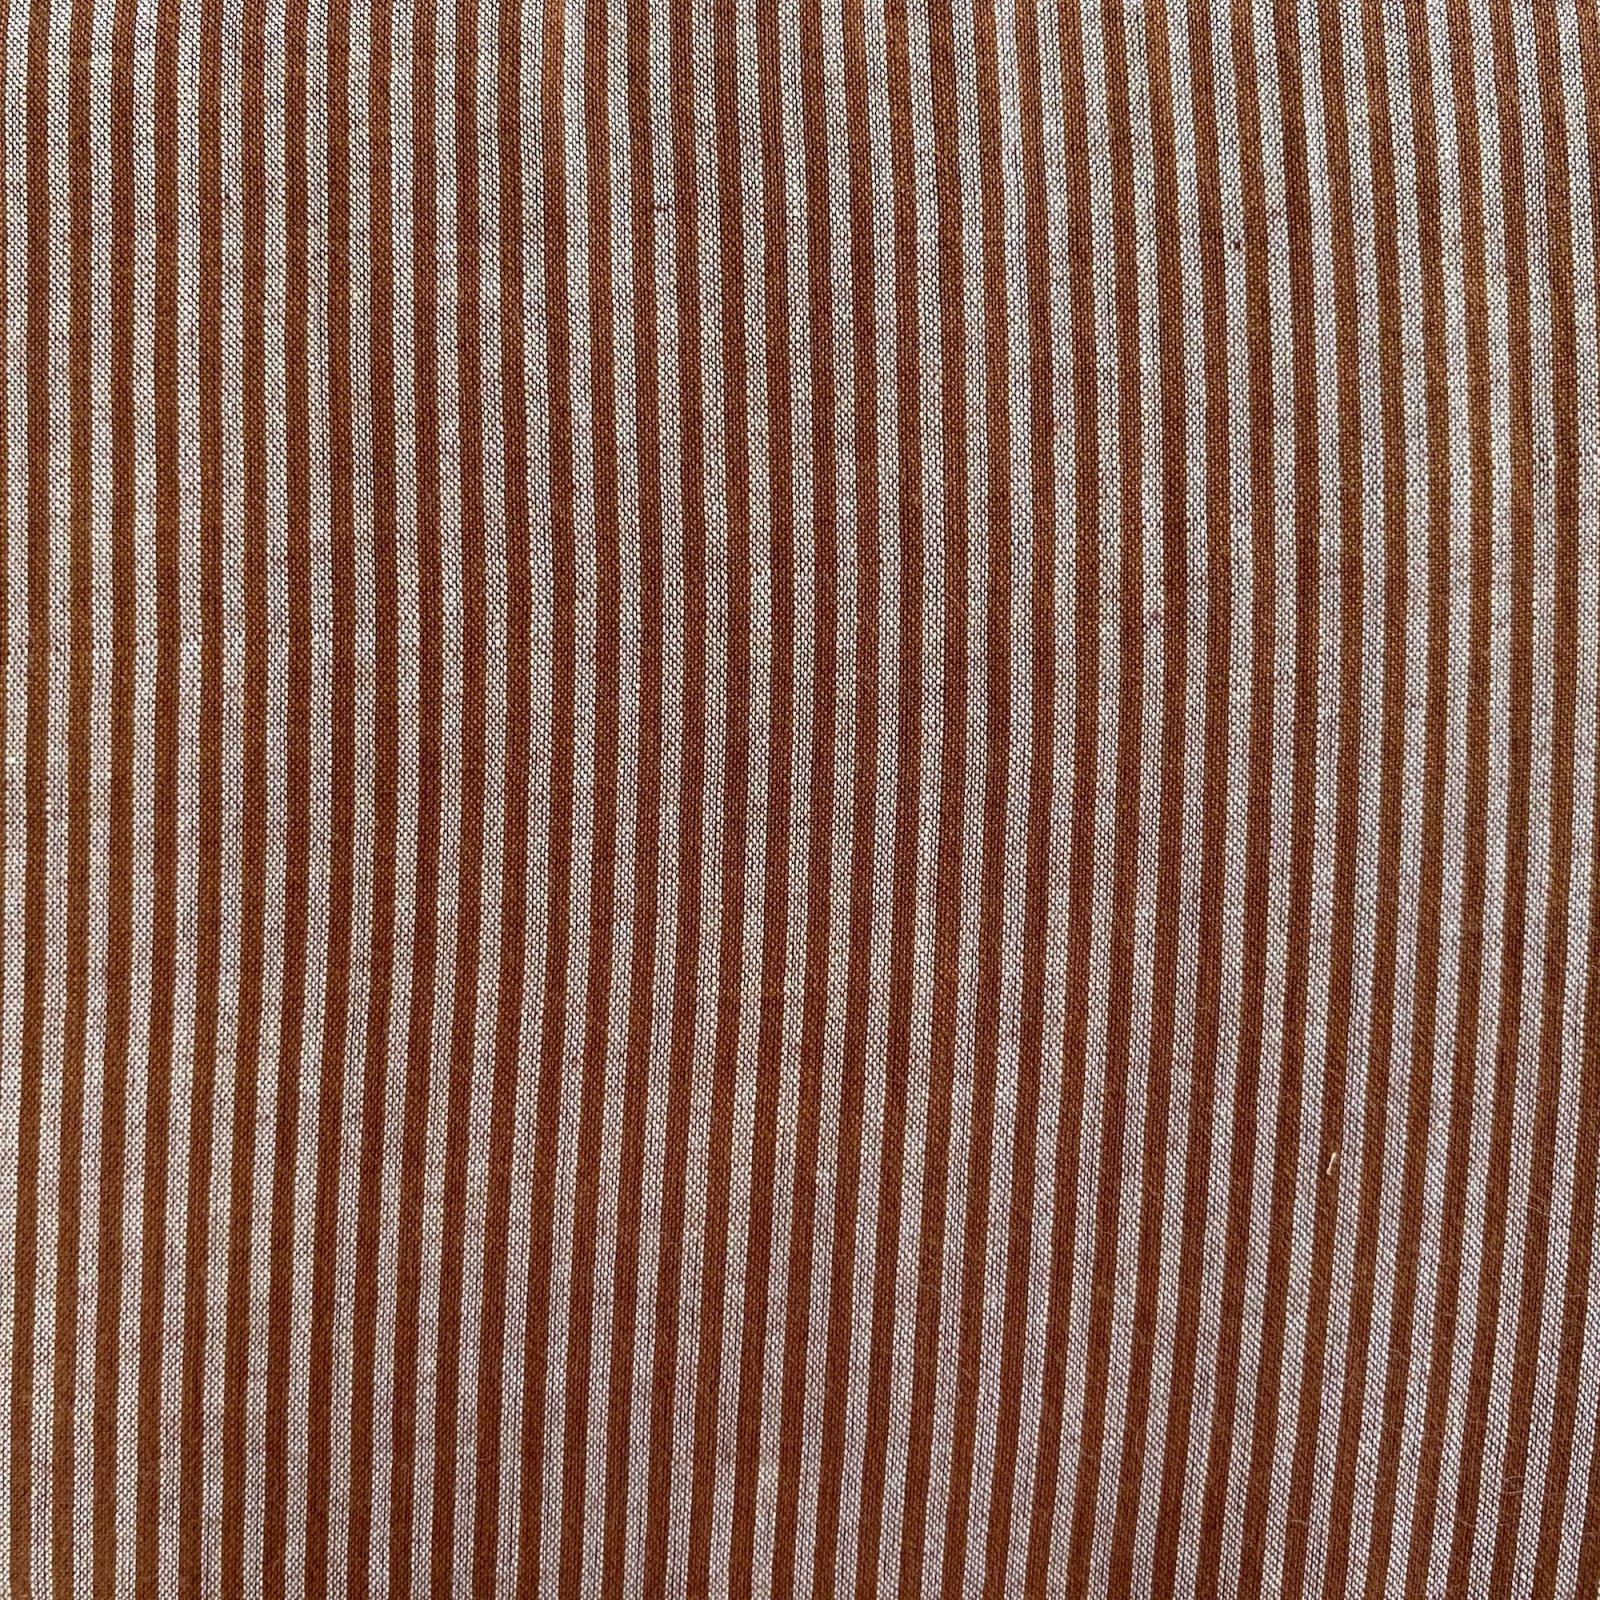 Rust and Cream Stripe, Fair Trade